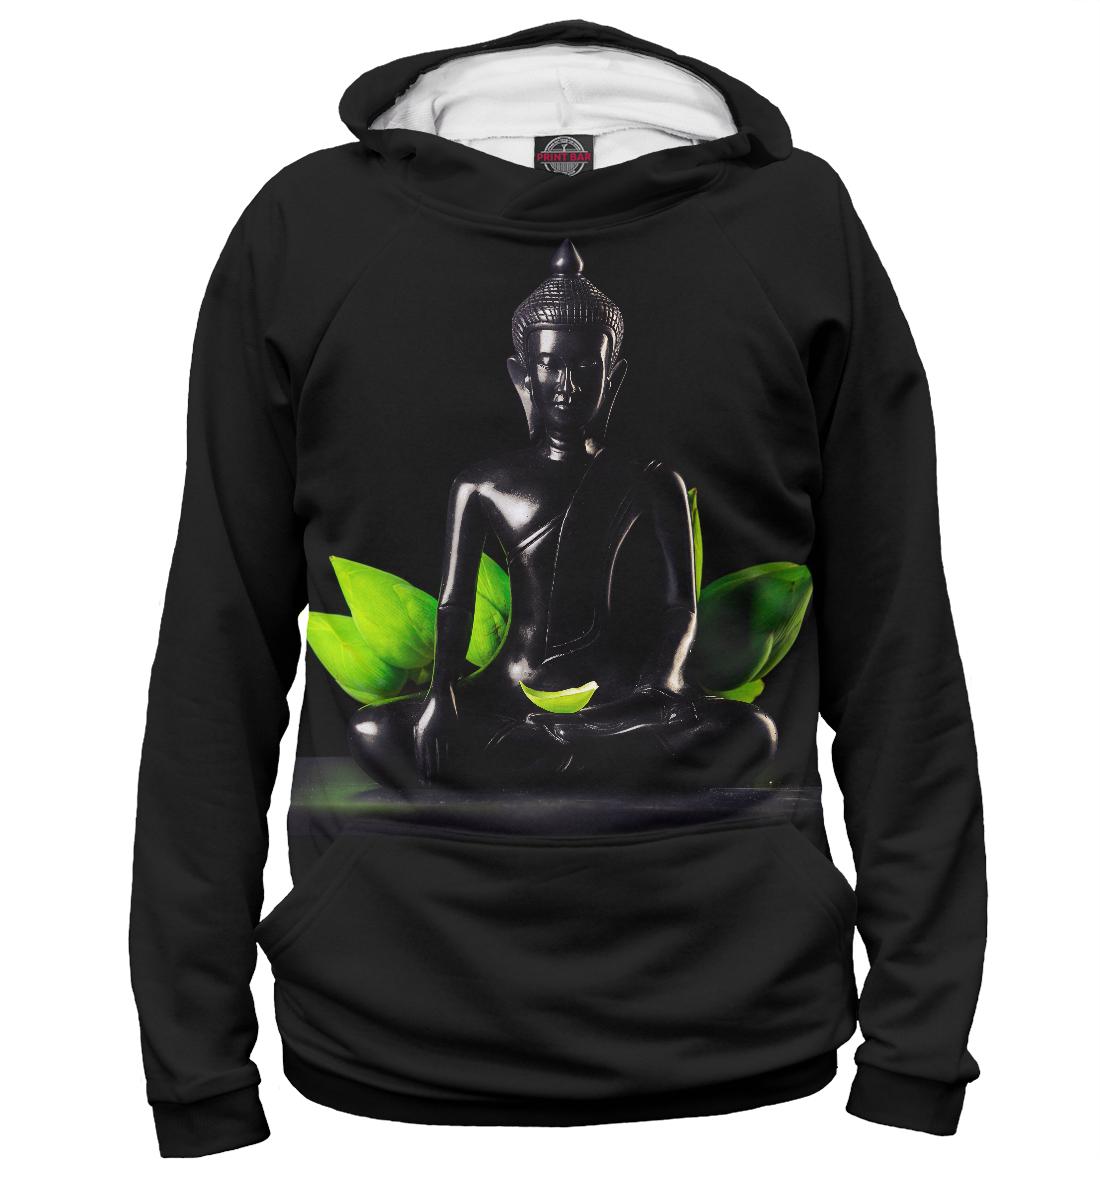 Купить Будда, Printbar, Худи, PSY-534416-hud-1